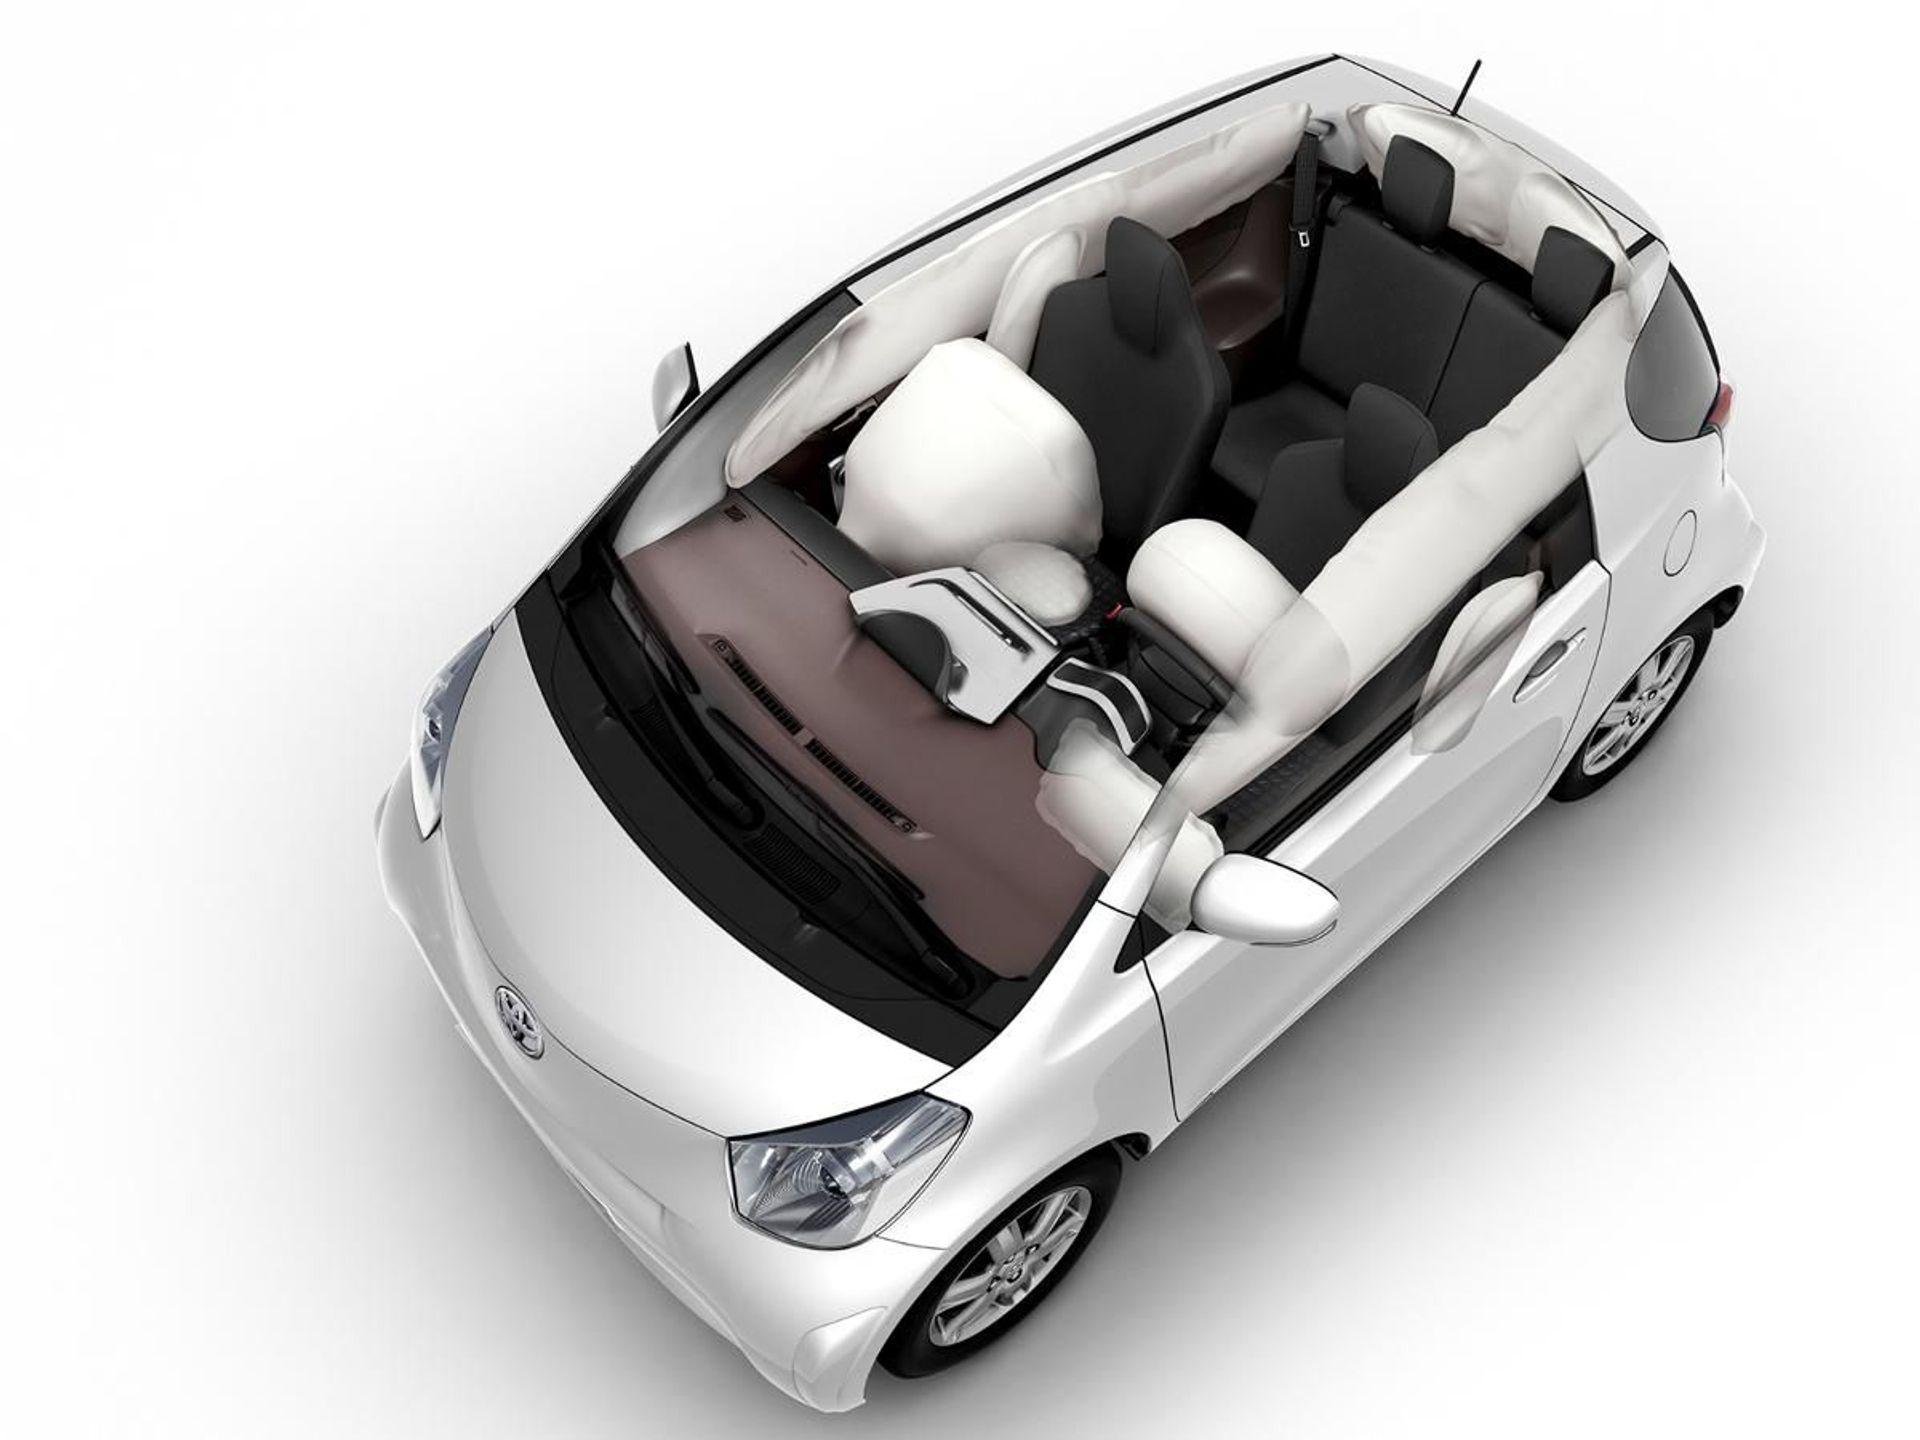 Toyota iQ  image